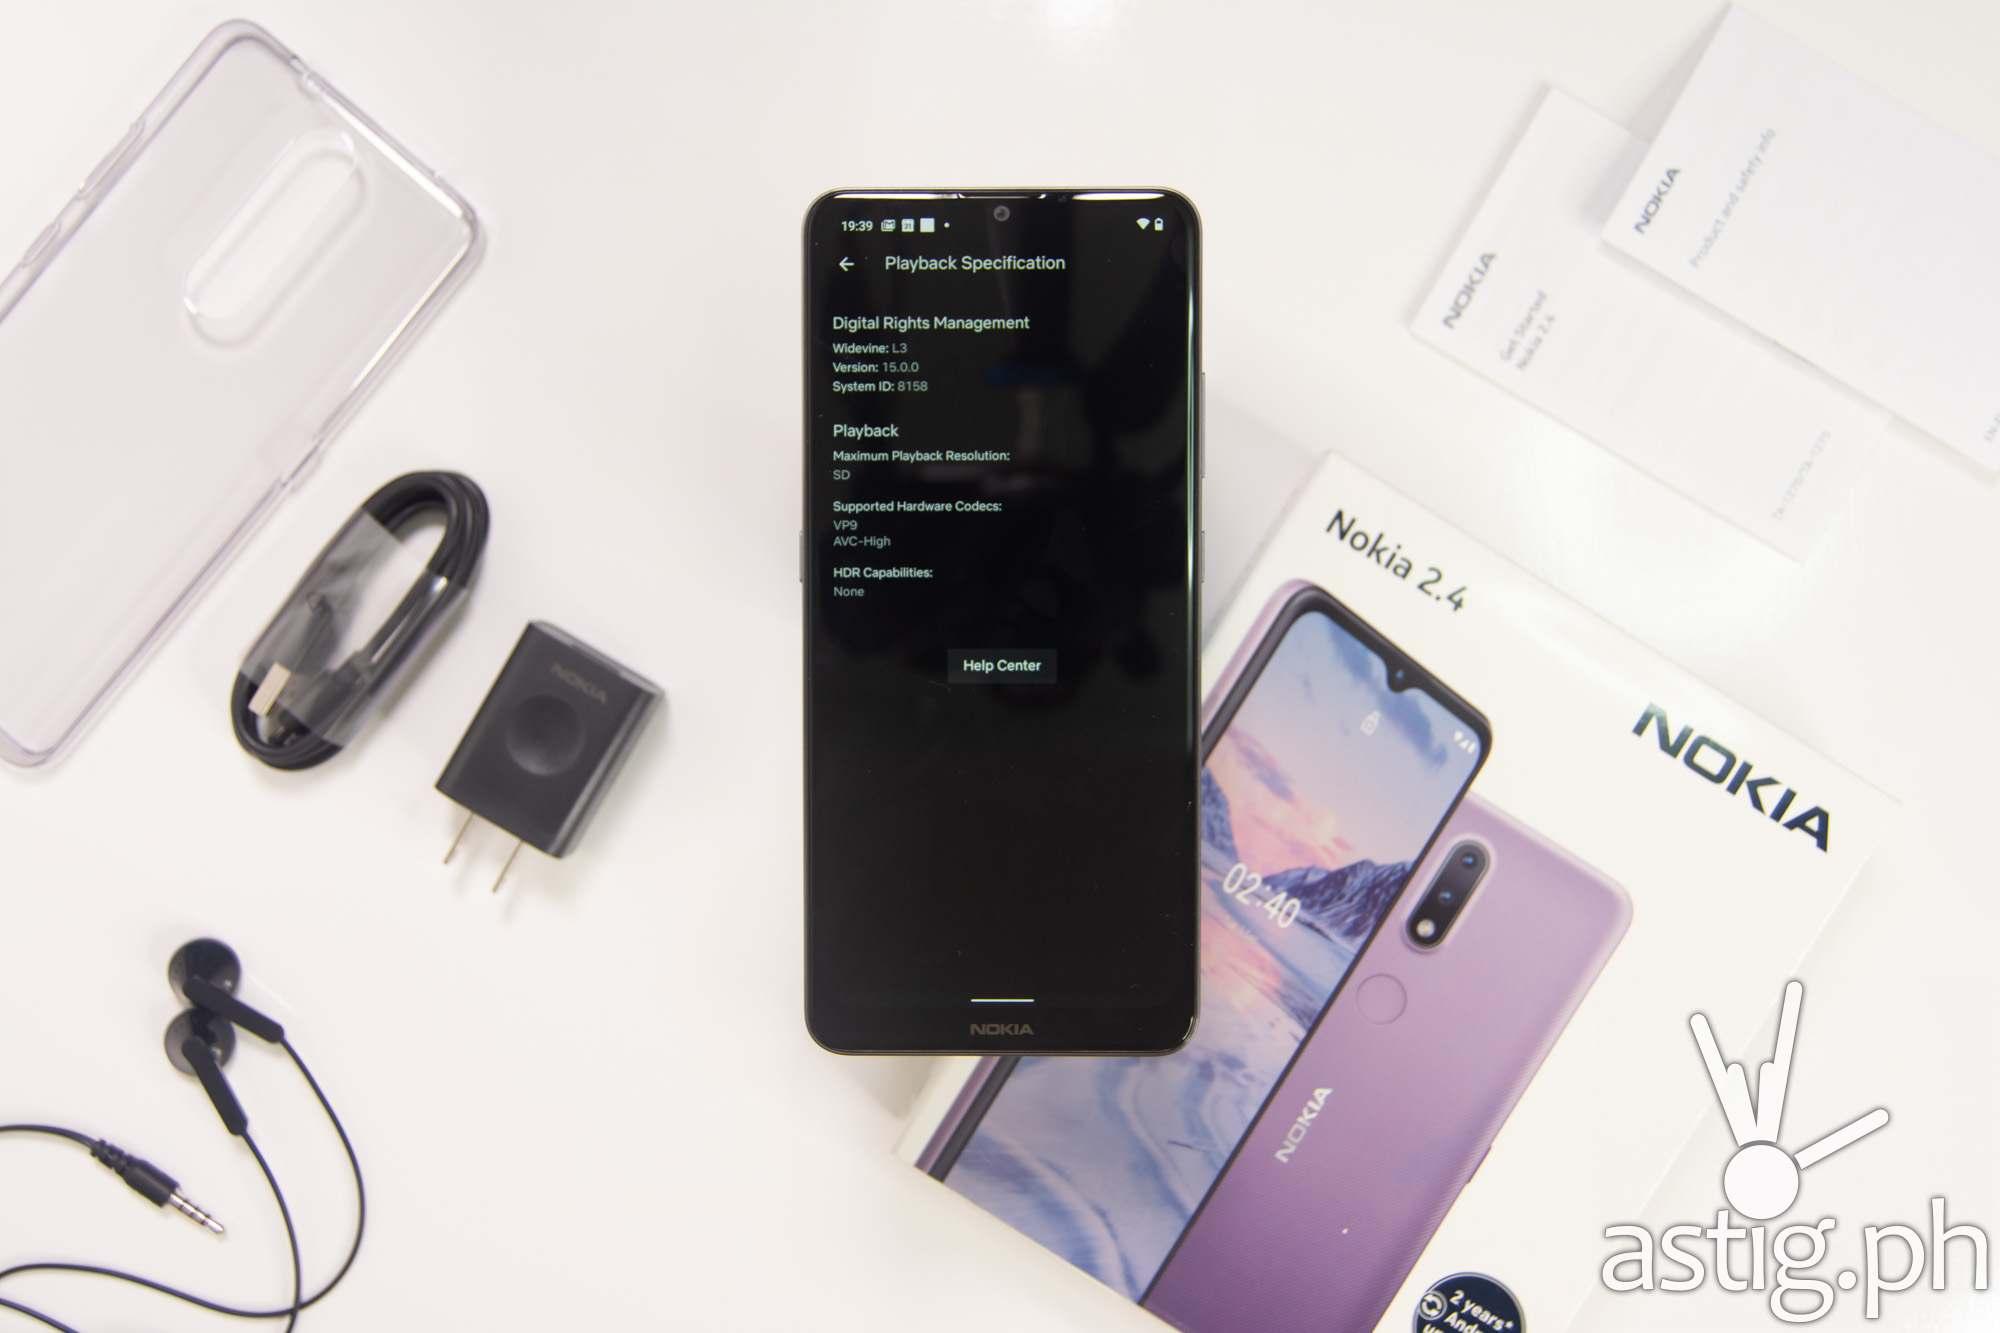 Netflix playback specs - Nokia 2.4 (Philippines)